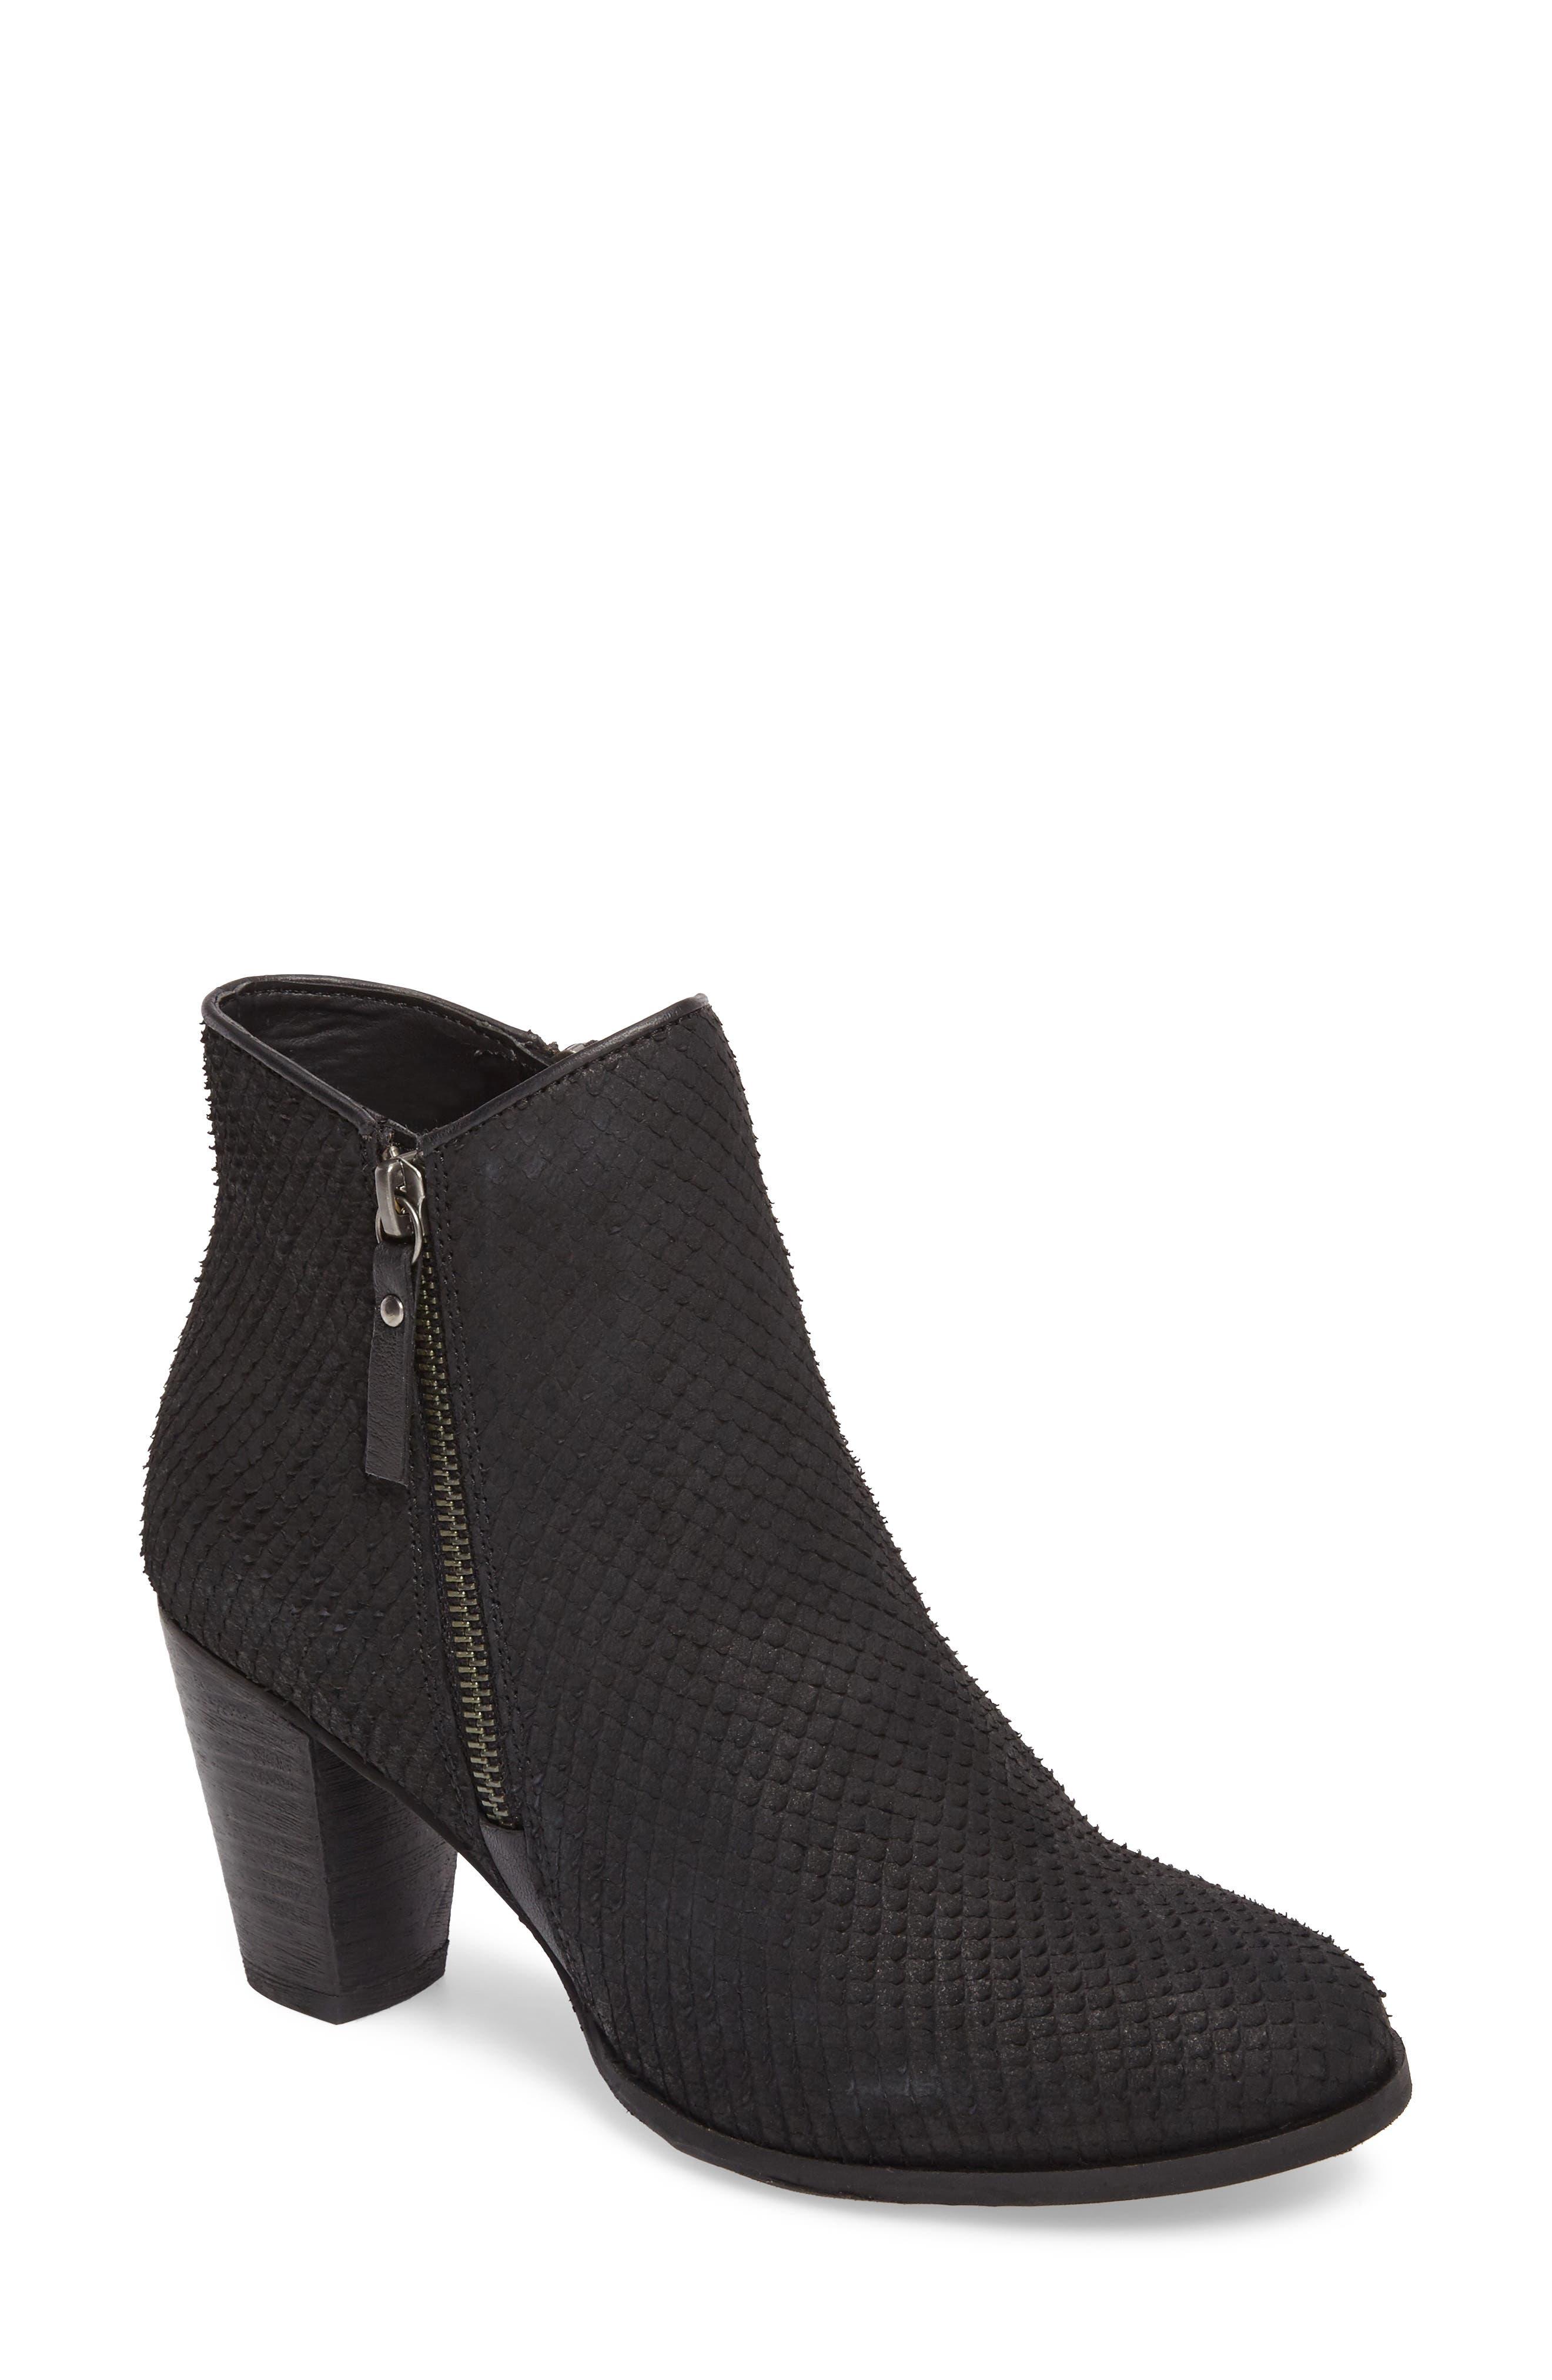 Maddock Block Heel Bootie,                         Main,                         color, BLACK/ BLACK